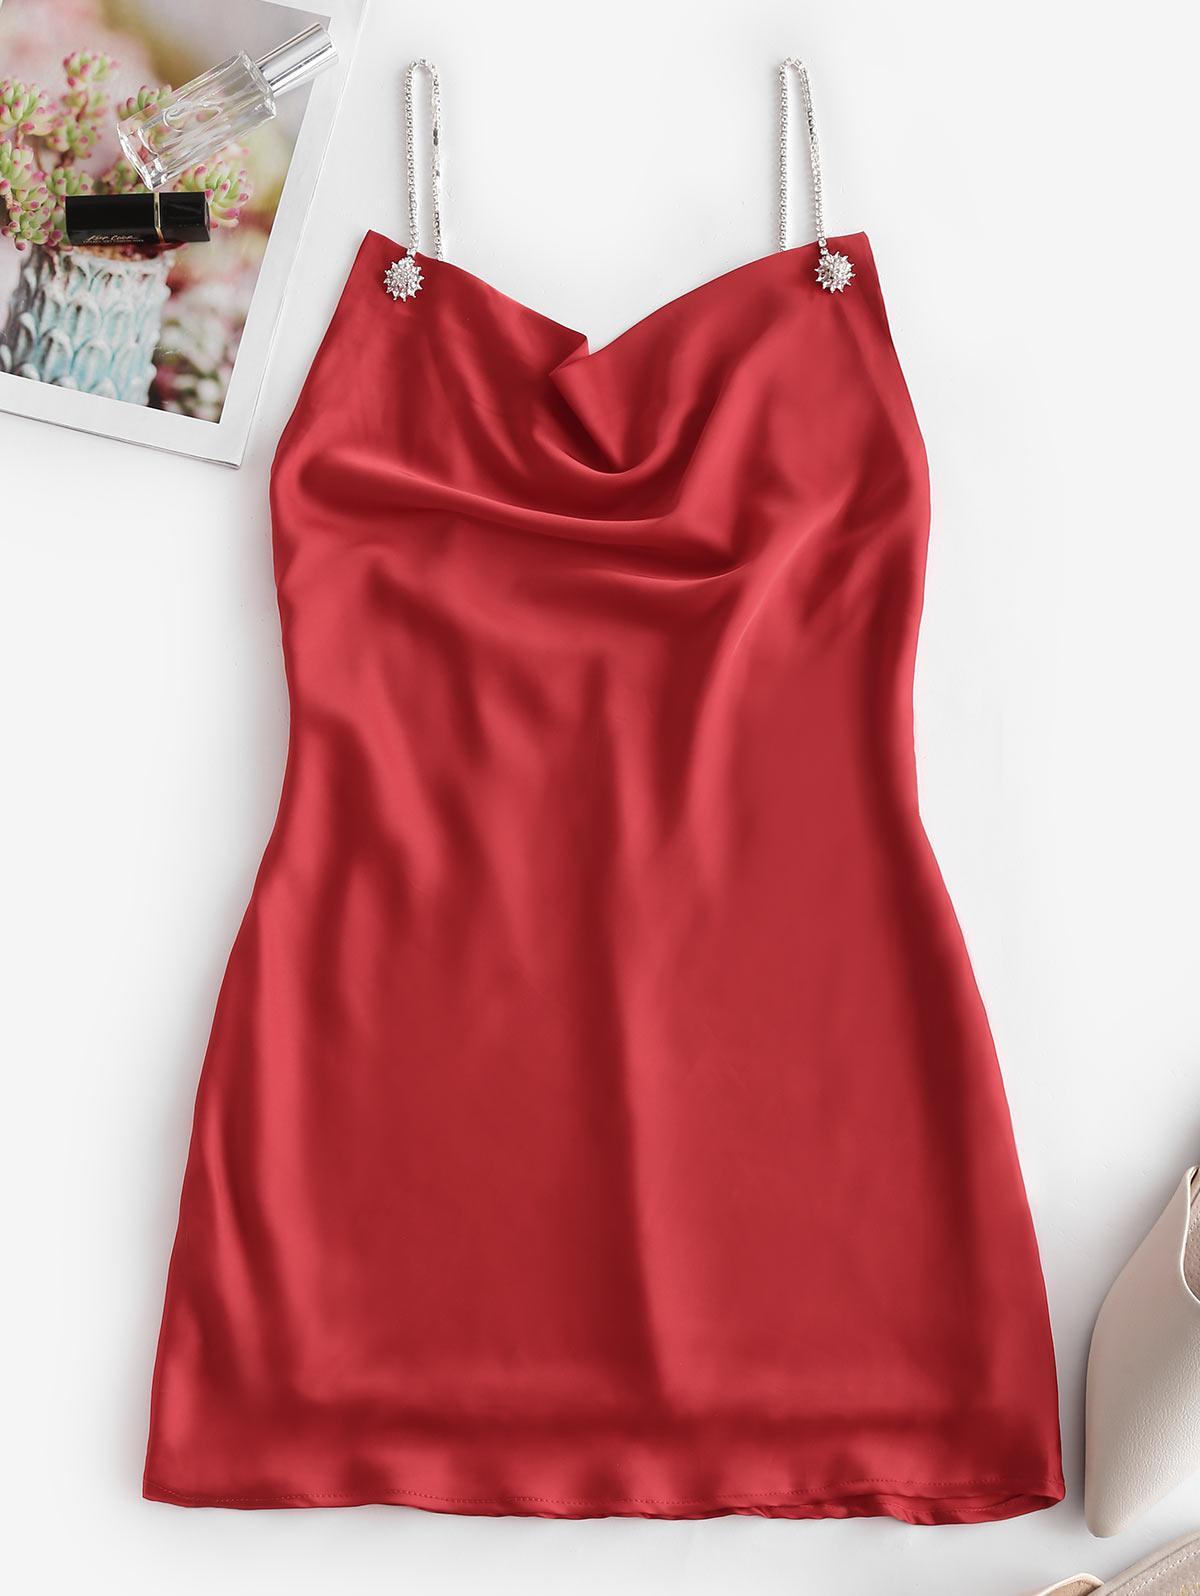 Rhinestone Chain Cowl Neck Satin Slip Dress